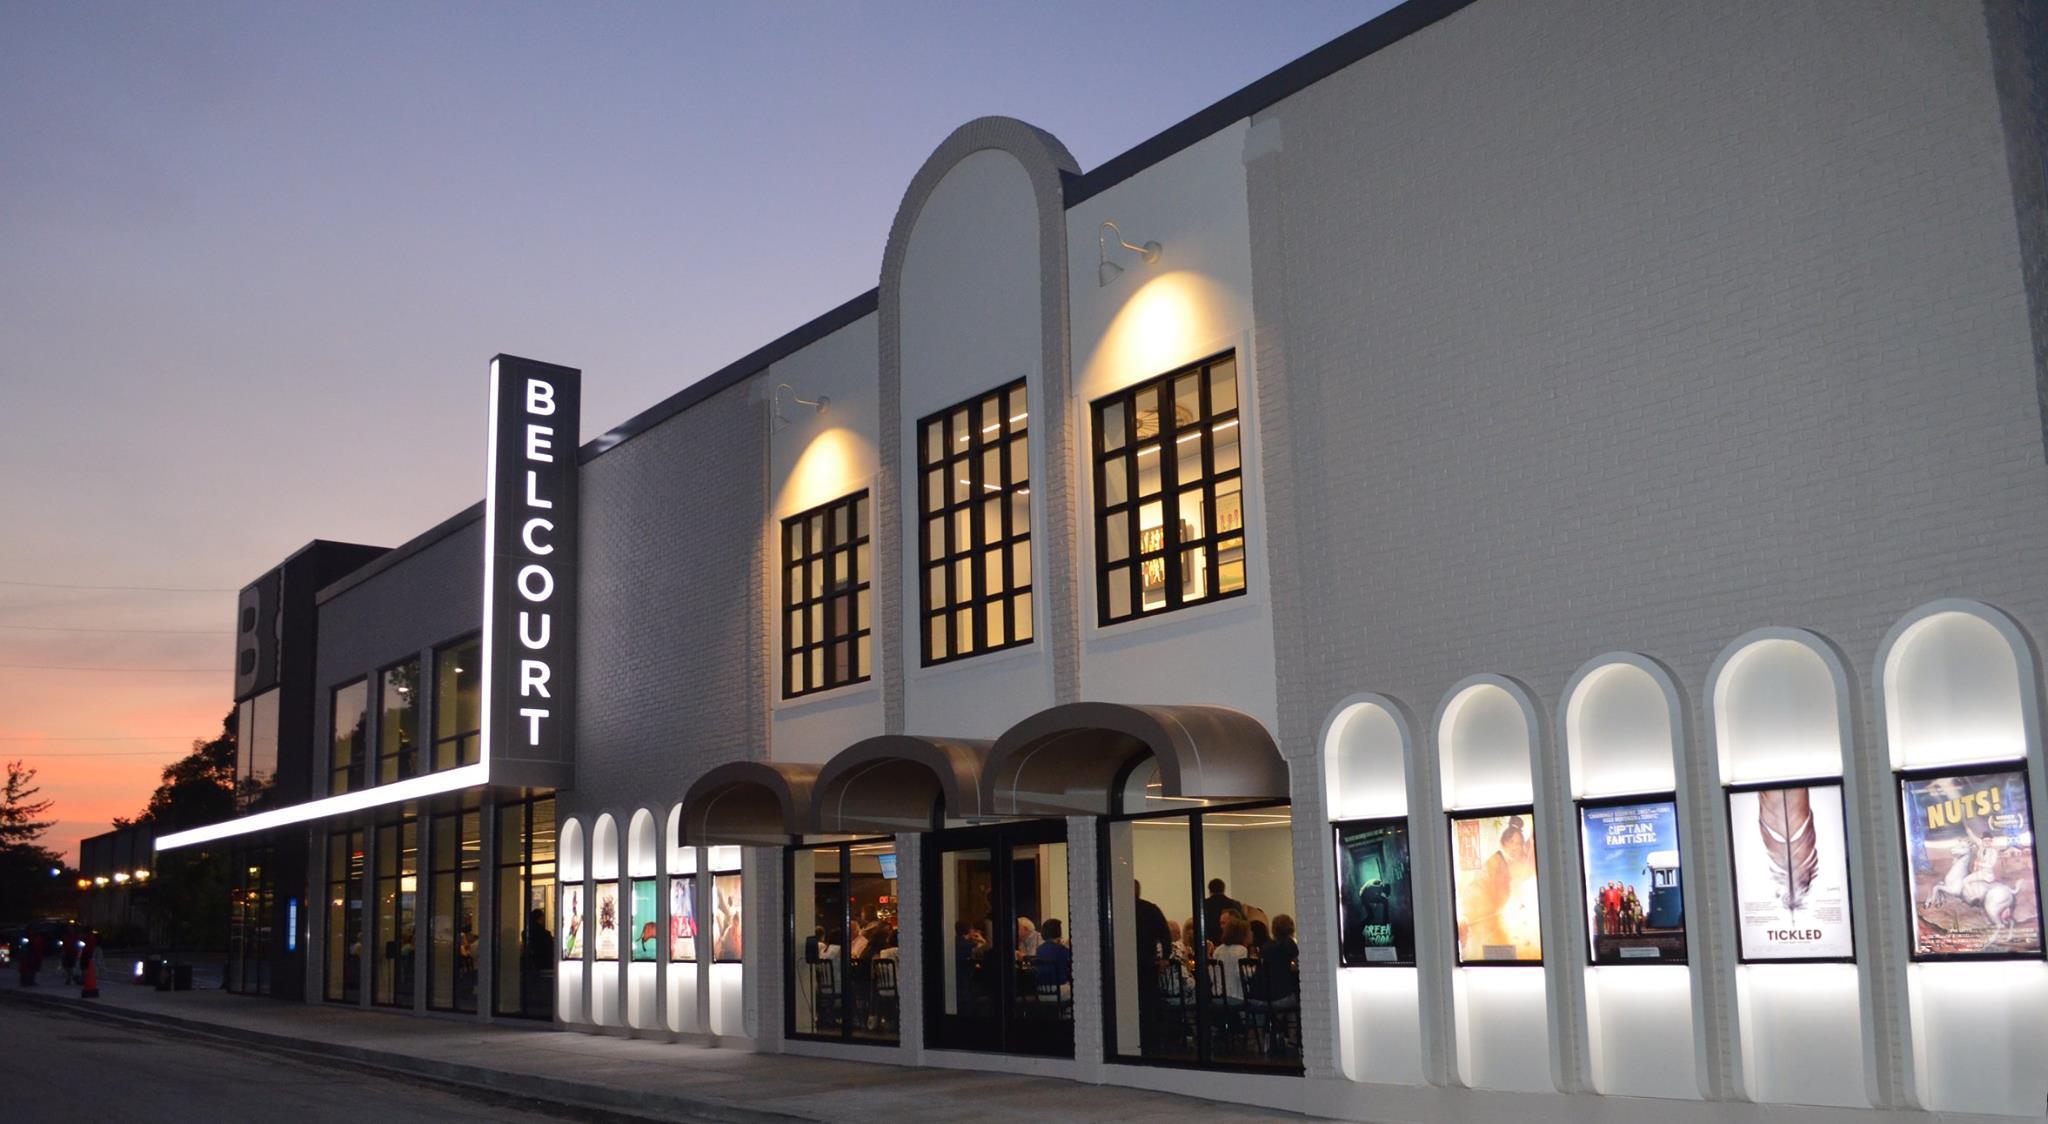 bekcourt theater